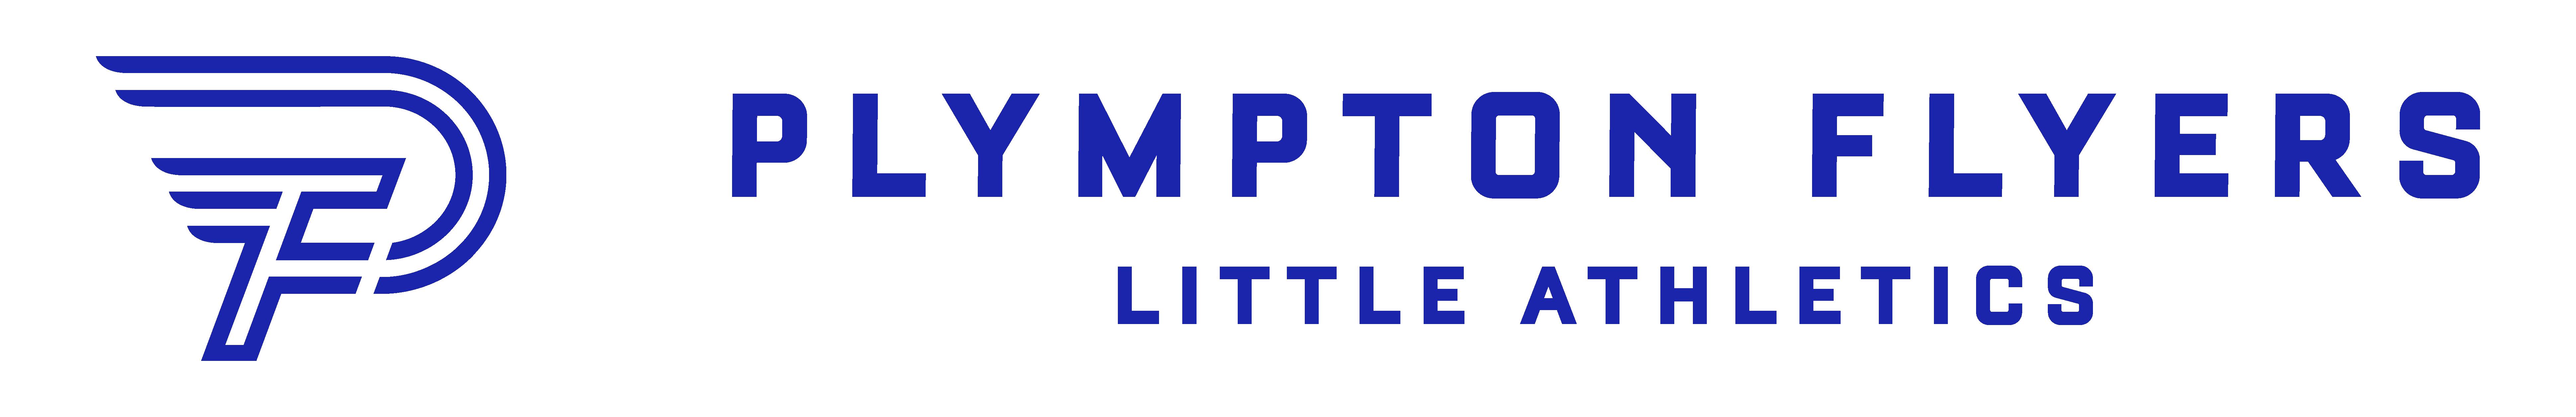 plympton flyers logo type final_Plympton Flyers Logotype-2